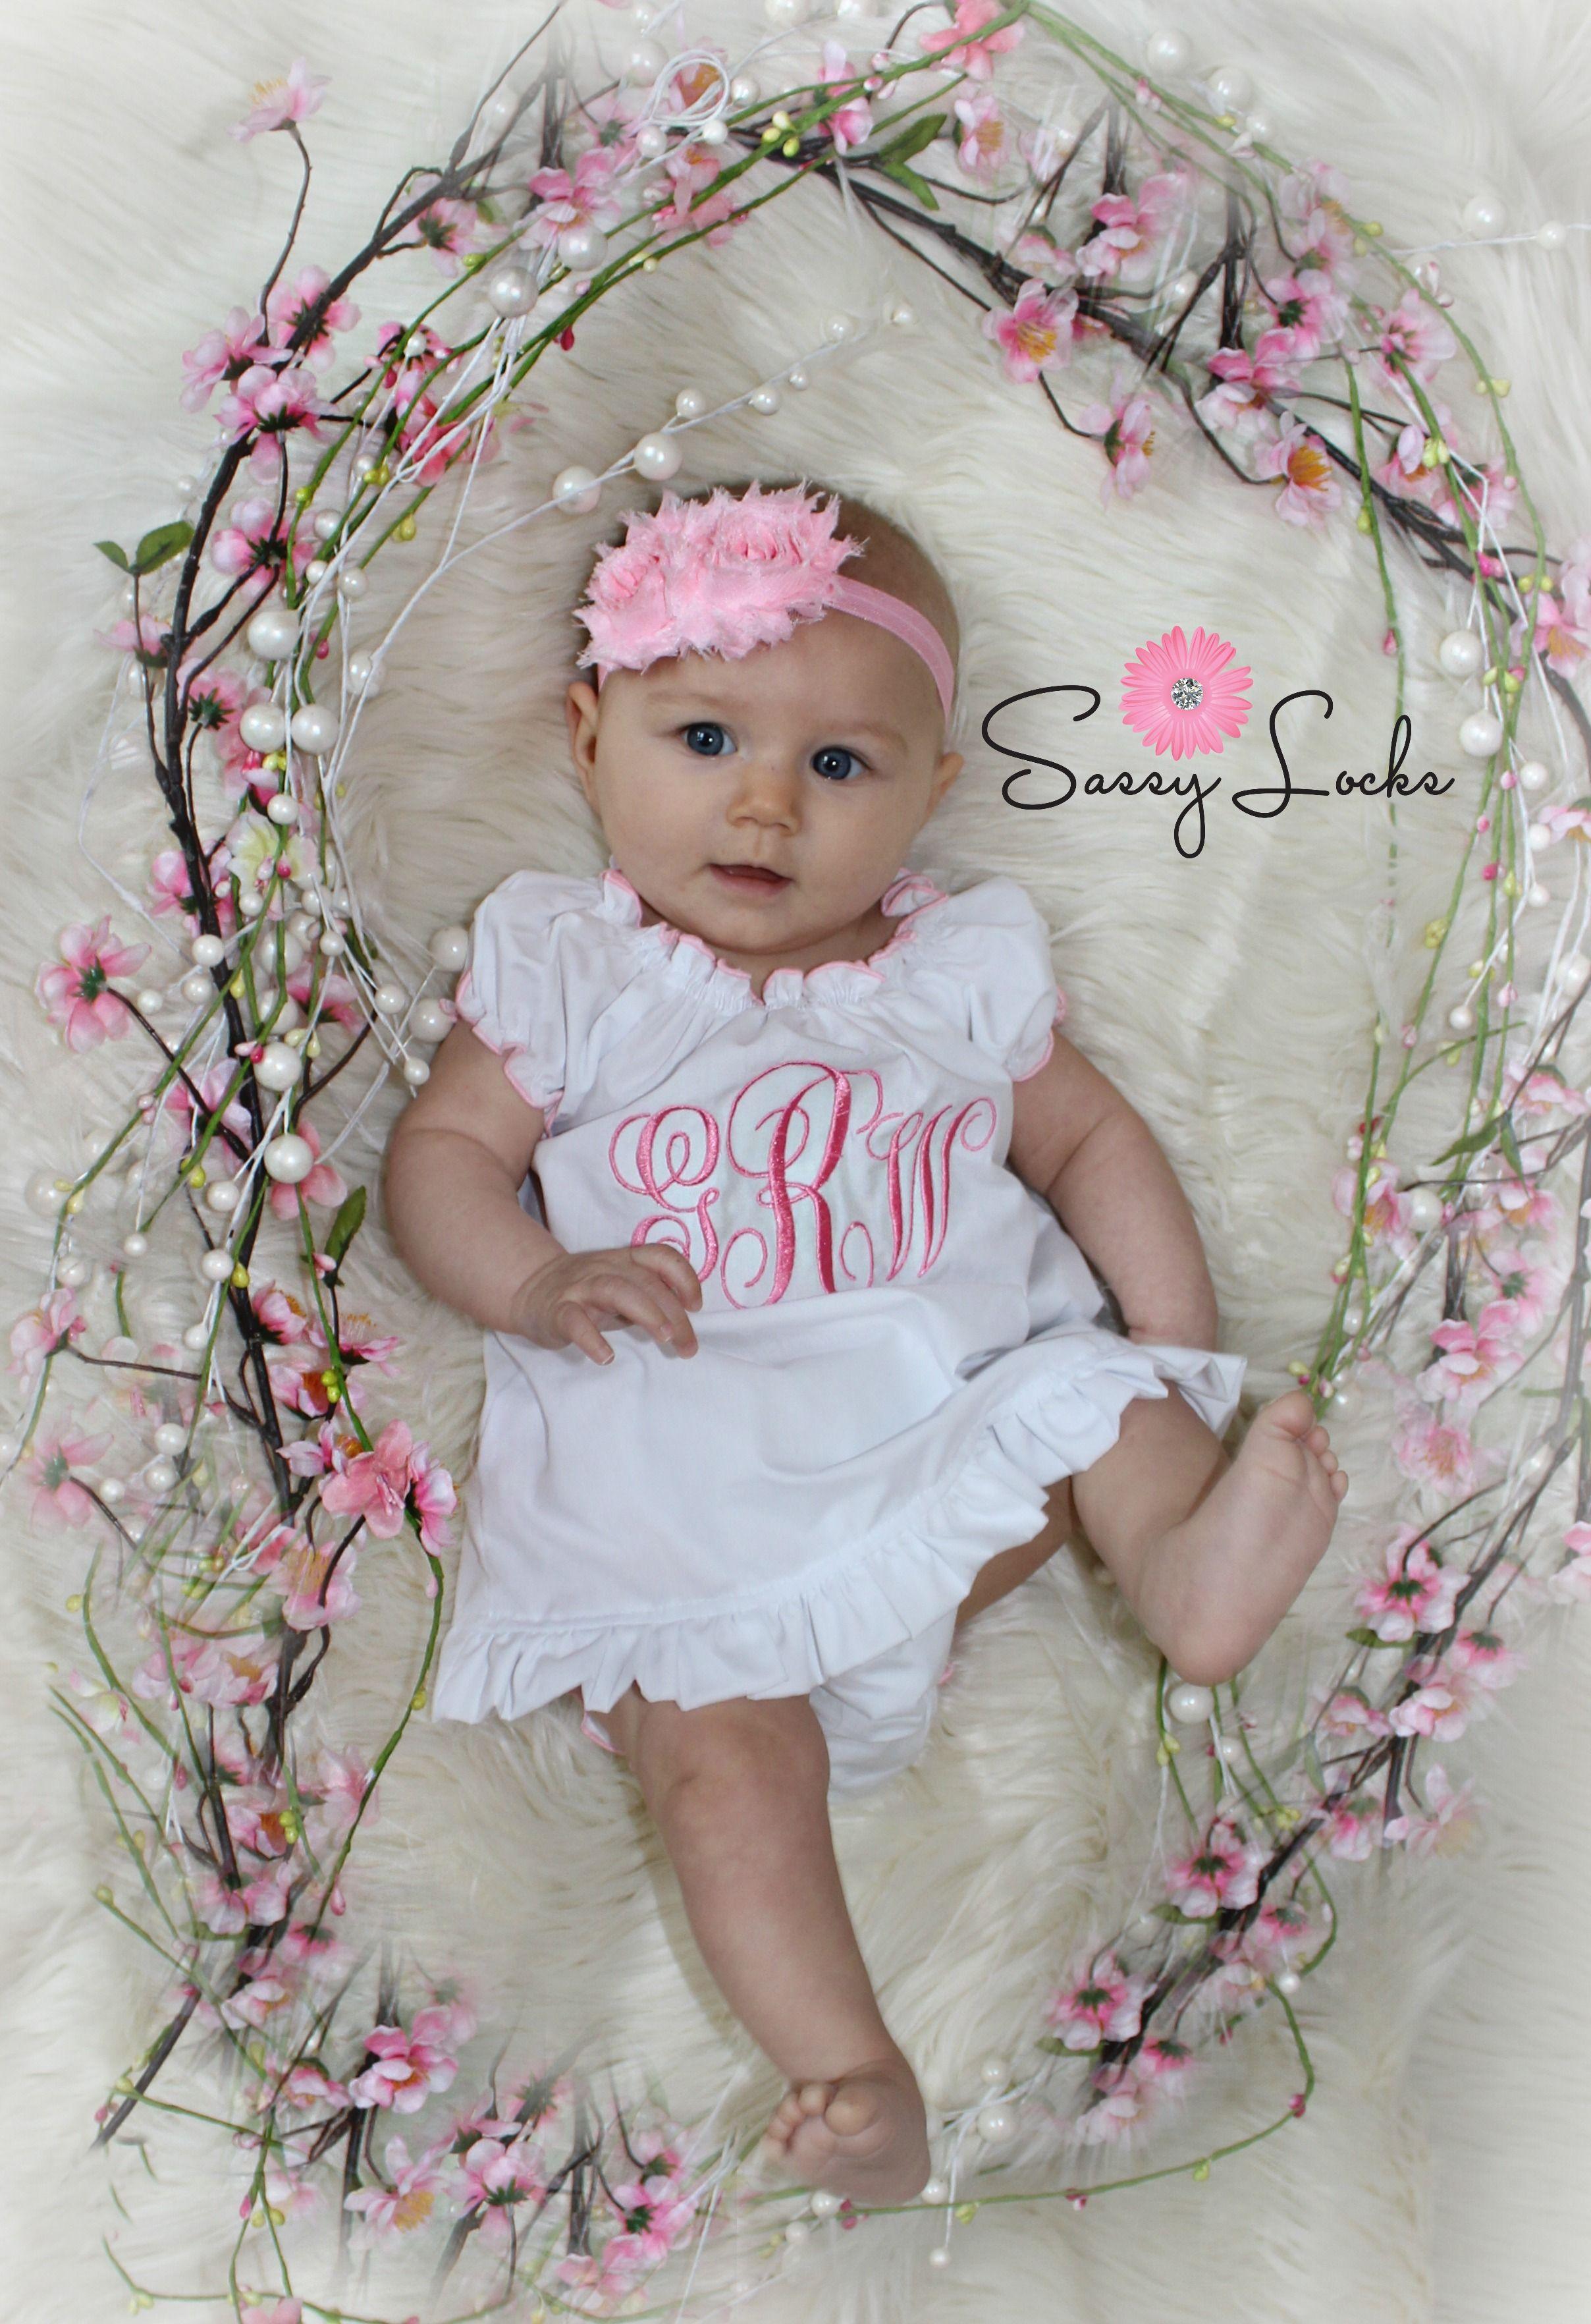 a6d71a5a15a6 Monogram Baby Girl Dress Ruffle Diaper Cover & Headband | Sassy ...